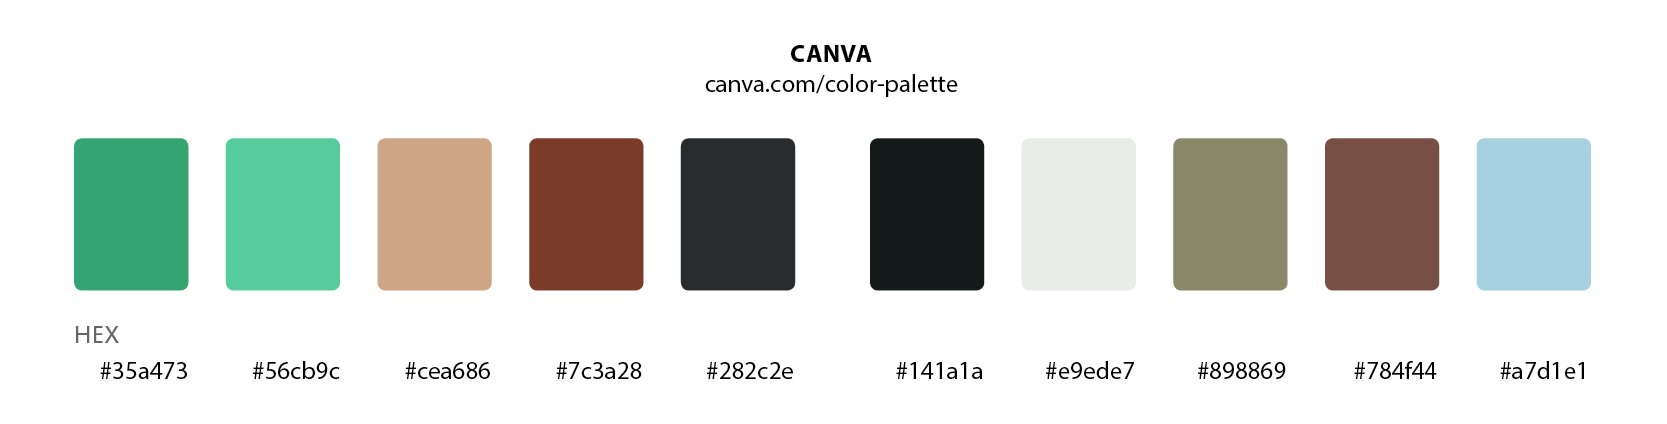 Canva Palette.png